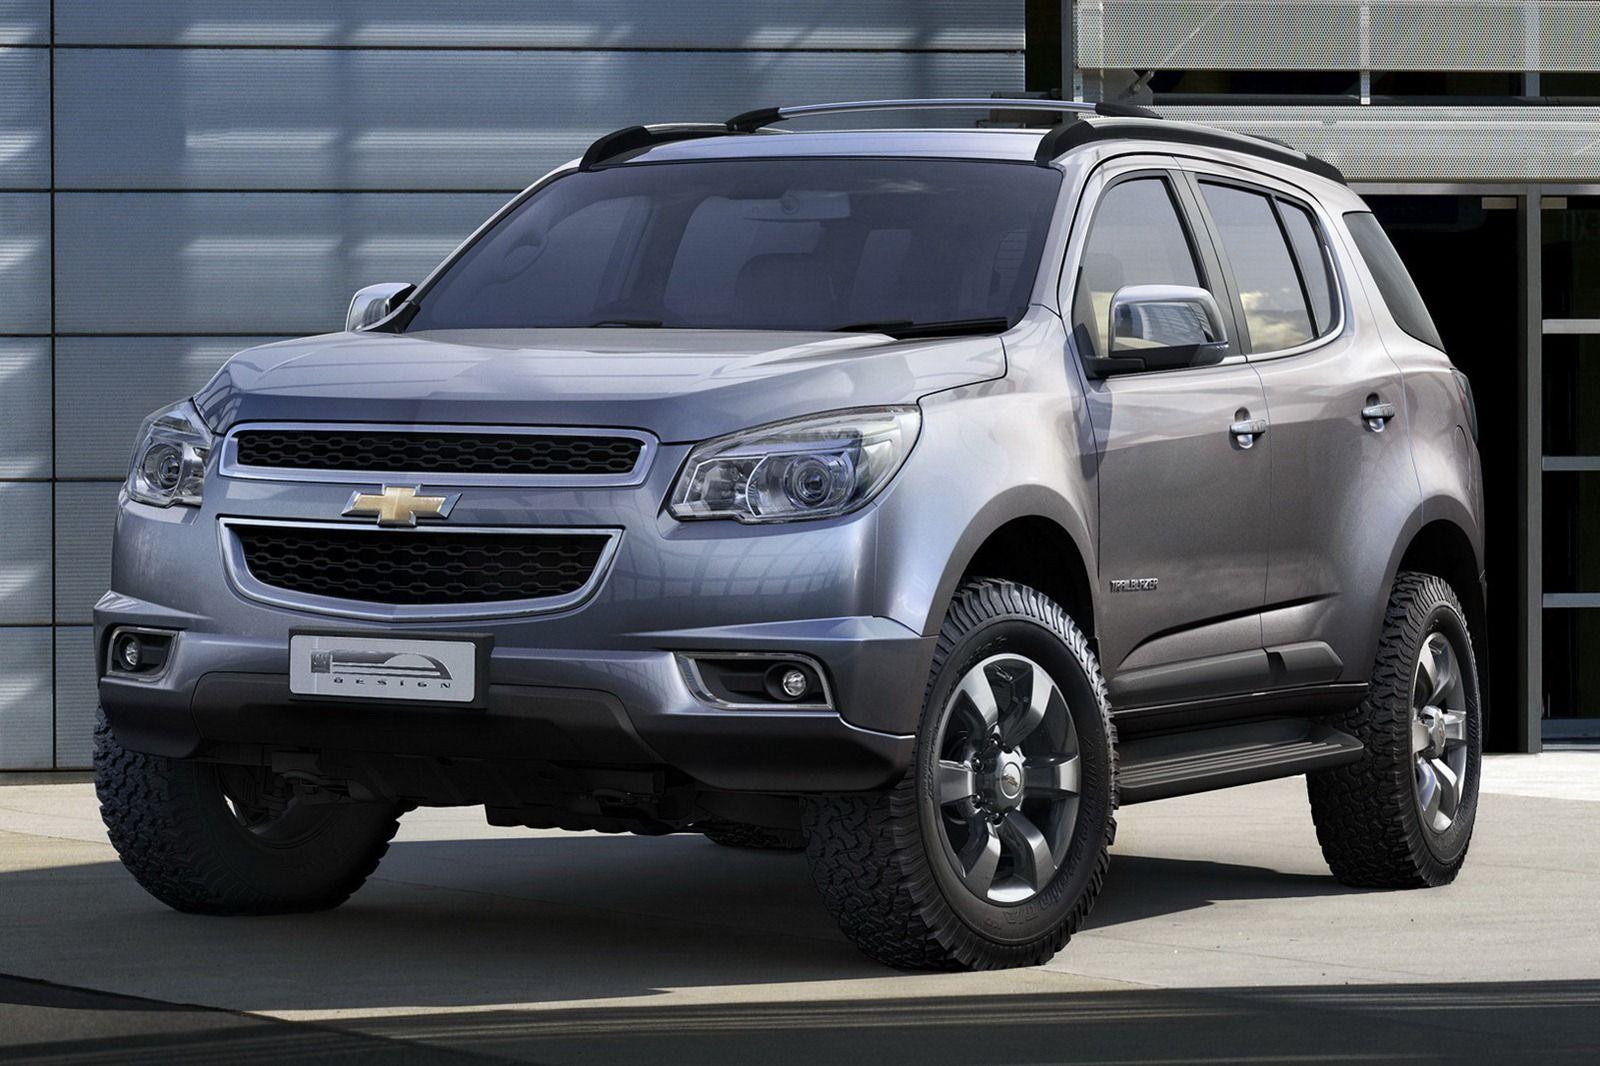 All New 2013 Chevrolet Trailblazer Asian Market Autos